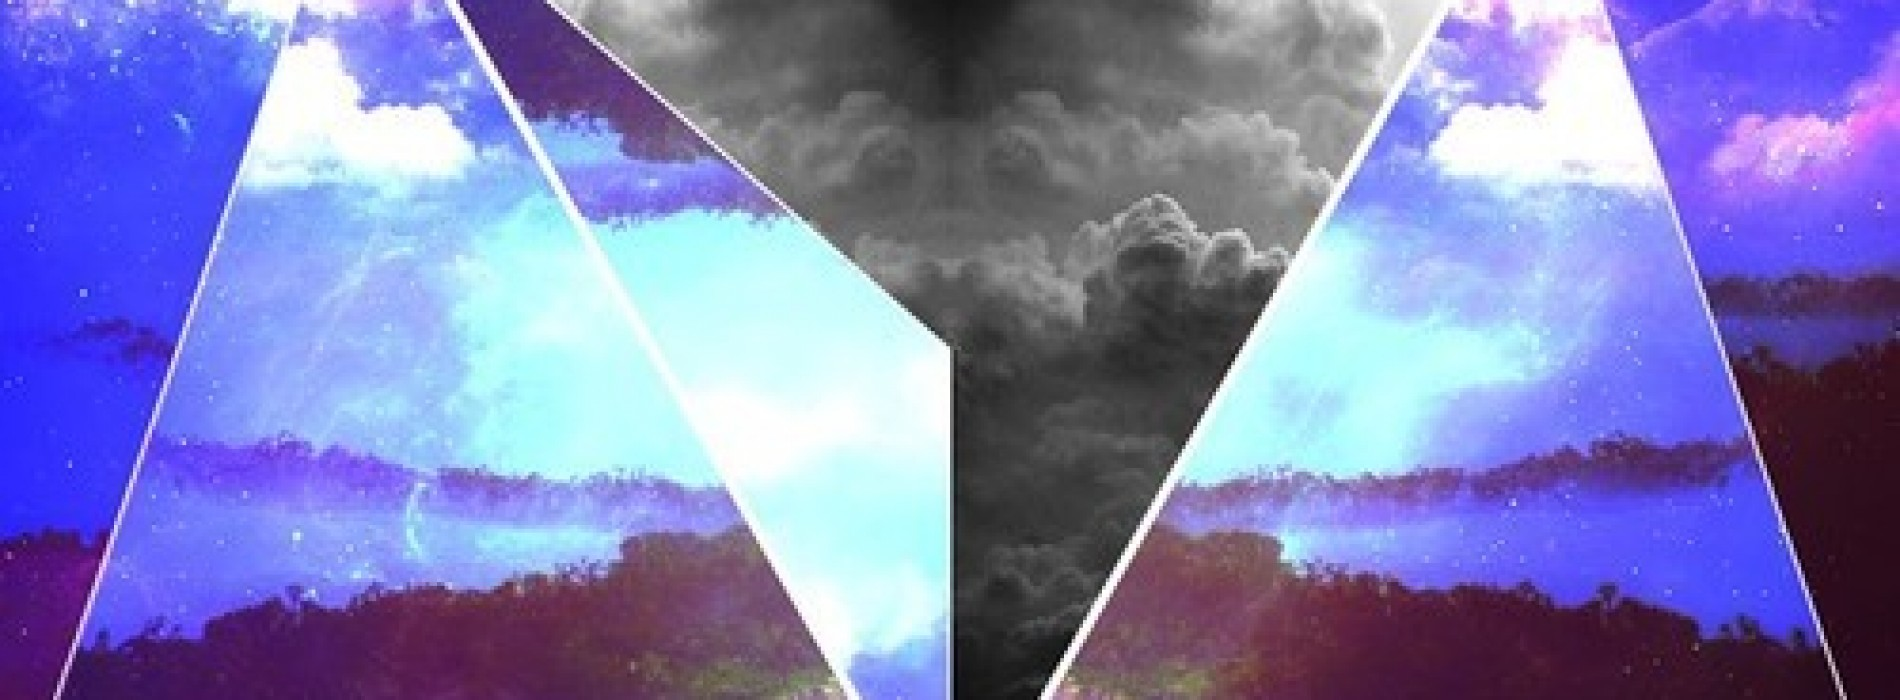 Enyo x Levito – Avalon (Dropwizz Remix)